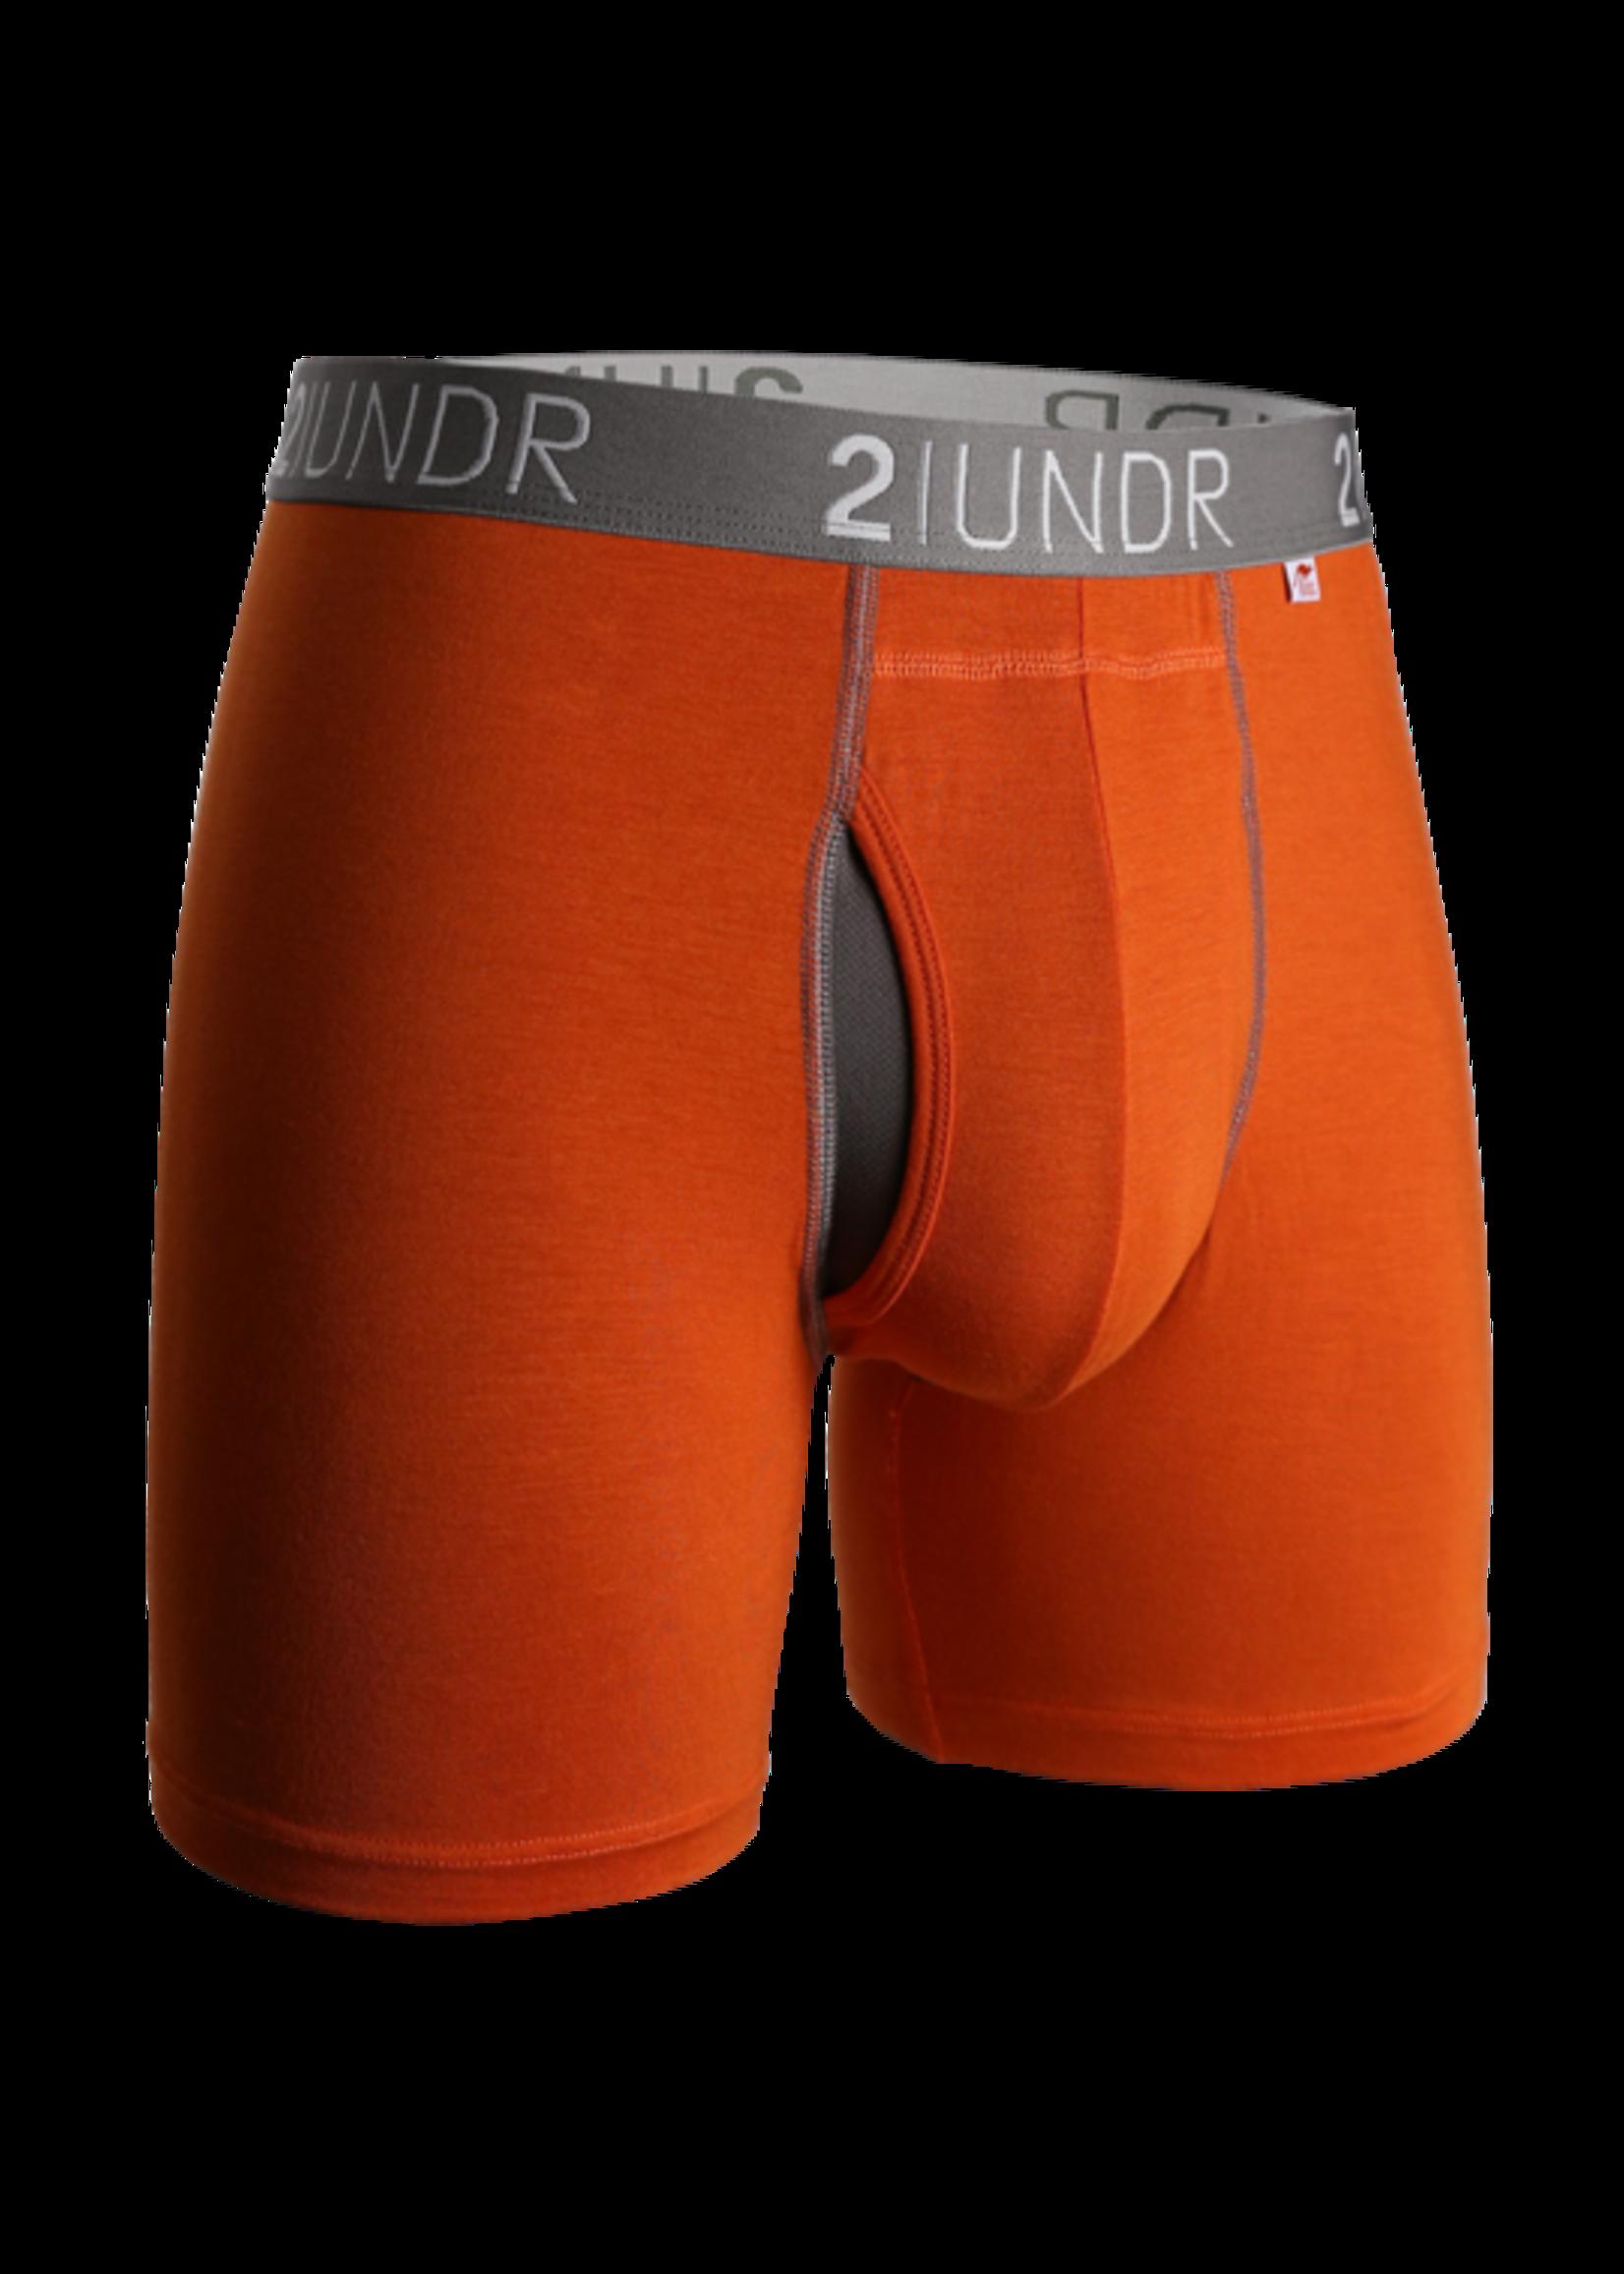 "2UNDR 2UNDR's ""Orange / Grey"" Swing Shift Boxer Brief"